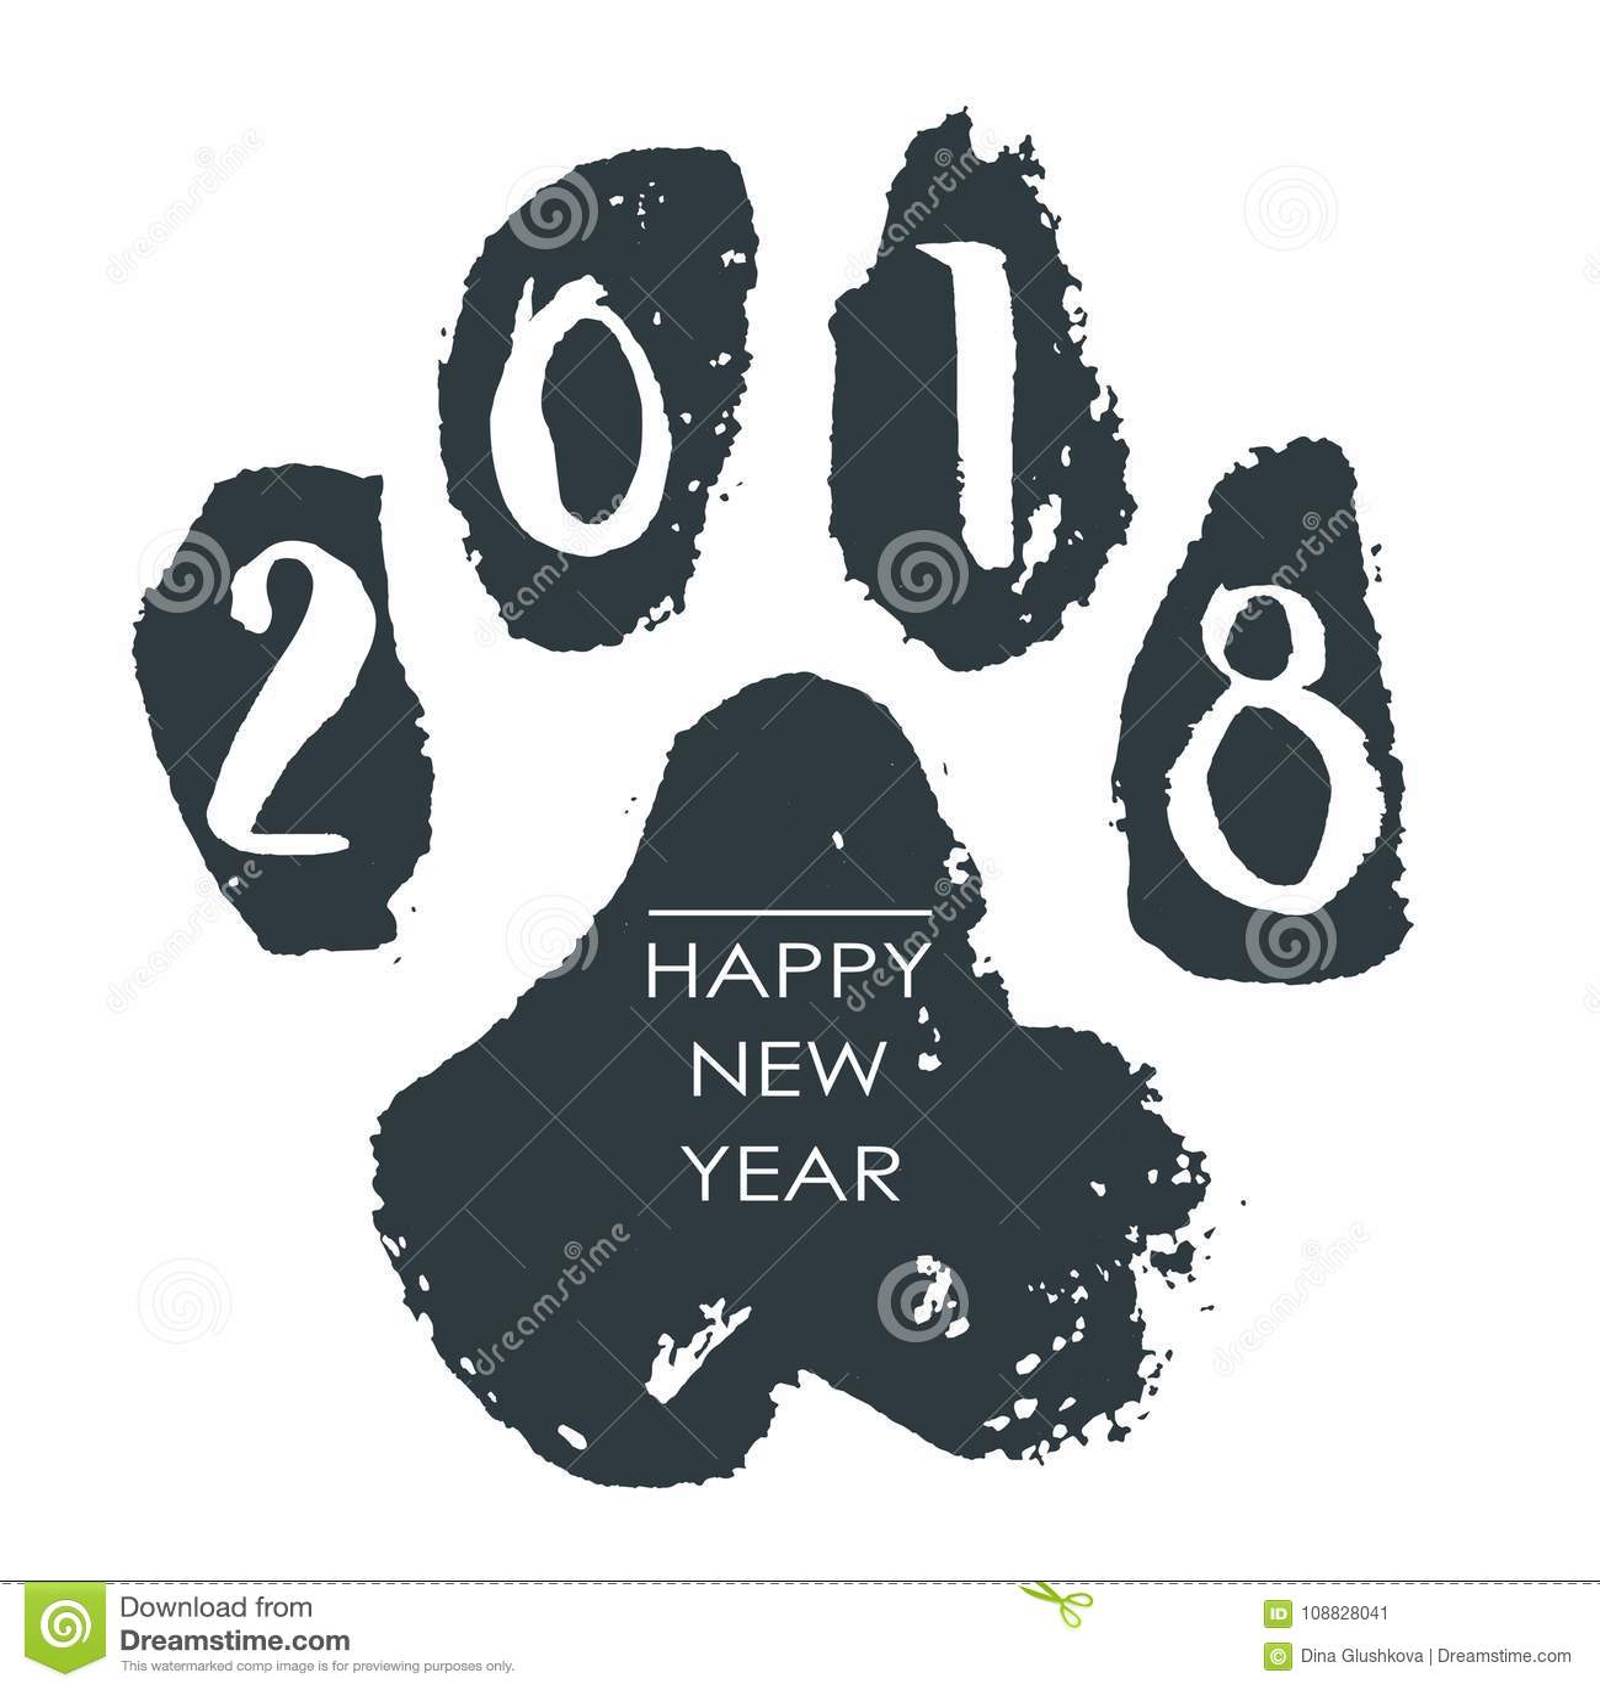 Black Hand Drawn Isolated Dog Footprint Grunge Ink Illustration